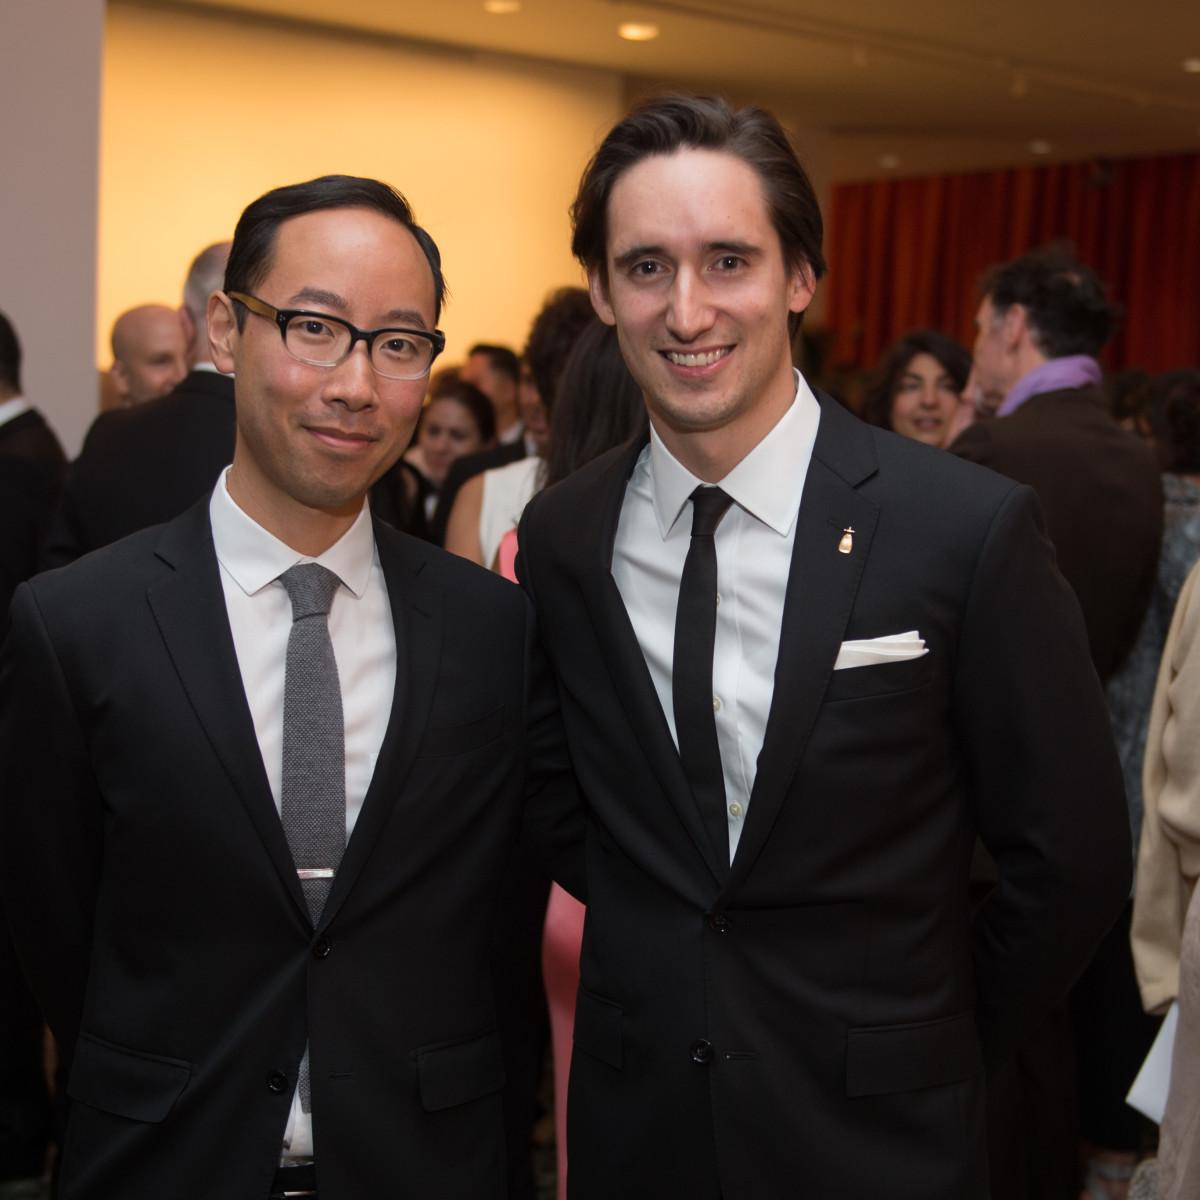 News, MFAH Latin Experience, Nov. 2015, Yuta Nakajima; Donald Johnson Montenegro;